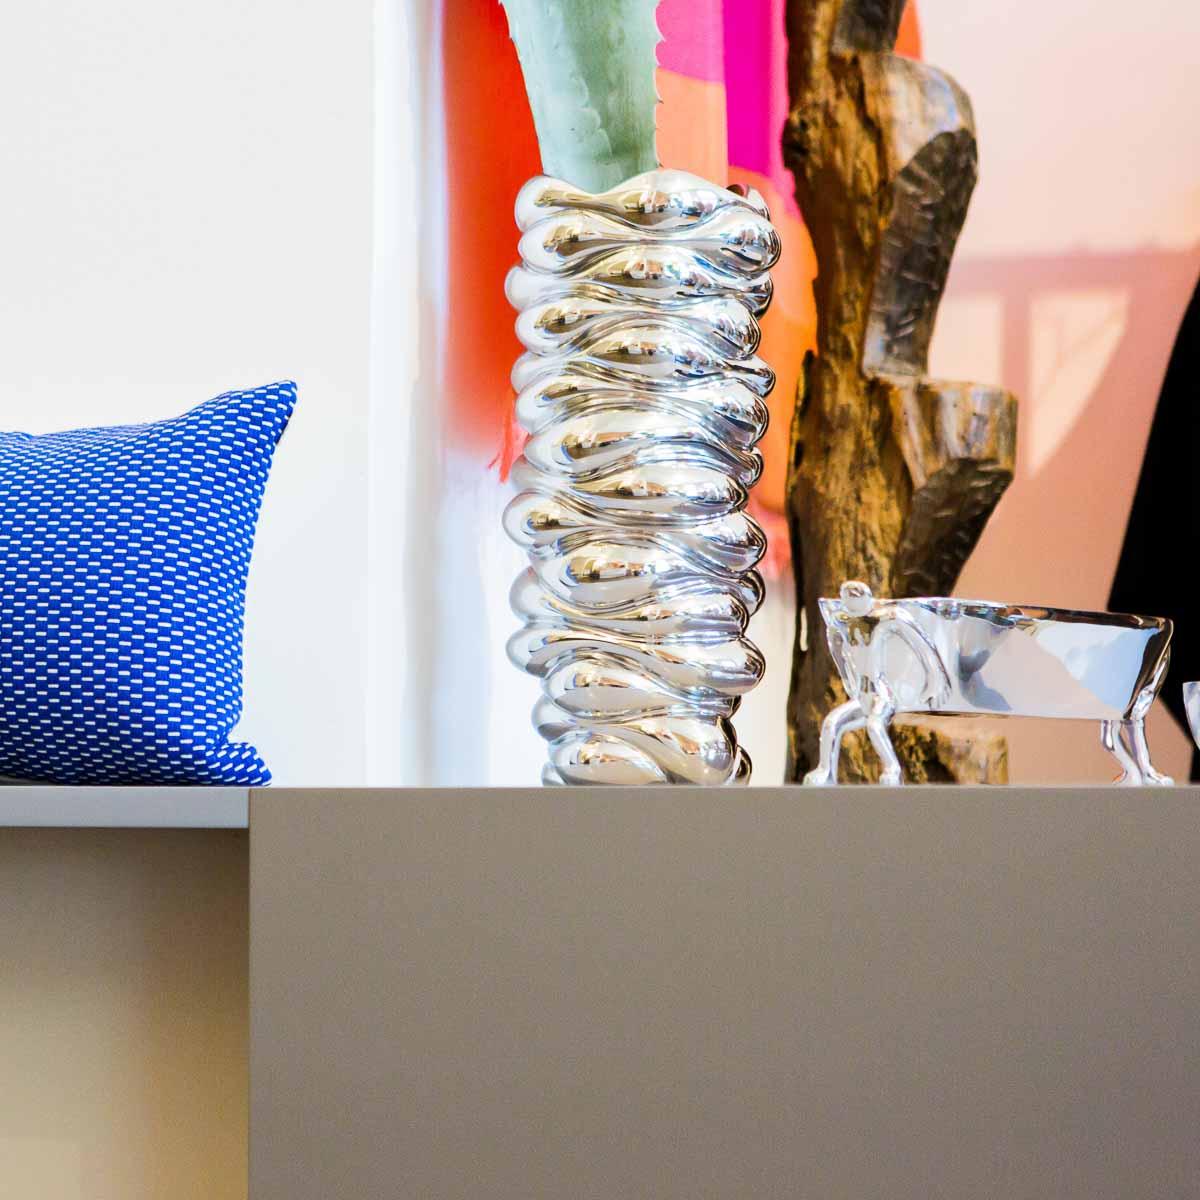 Habari Design Store Wien-6